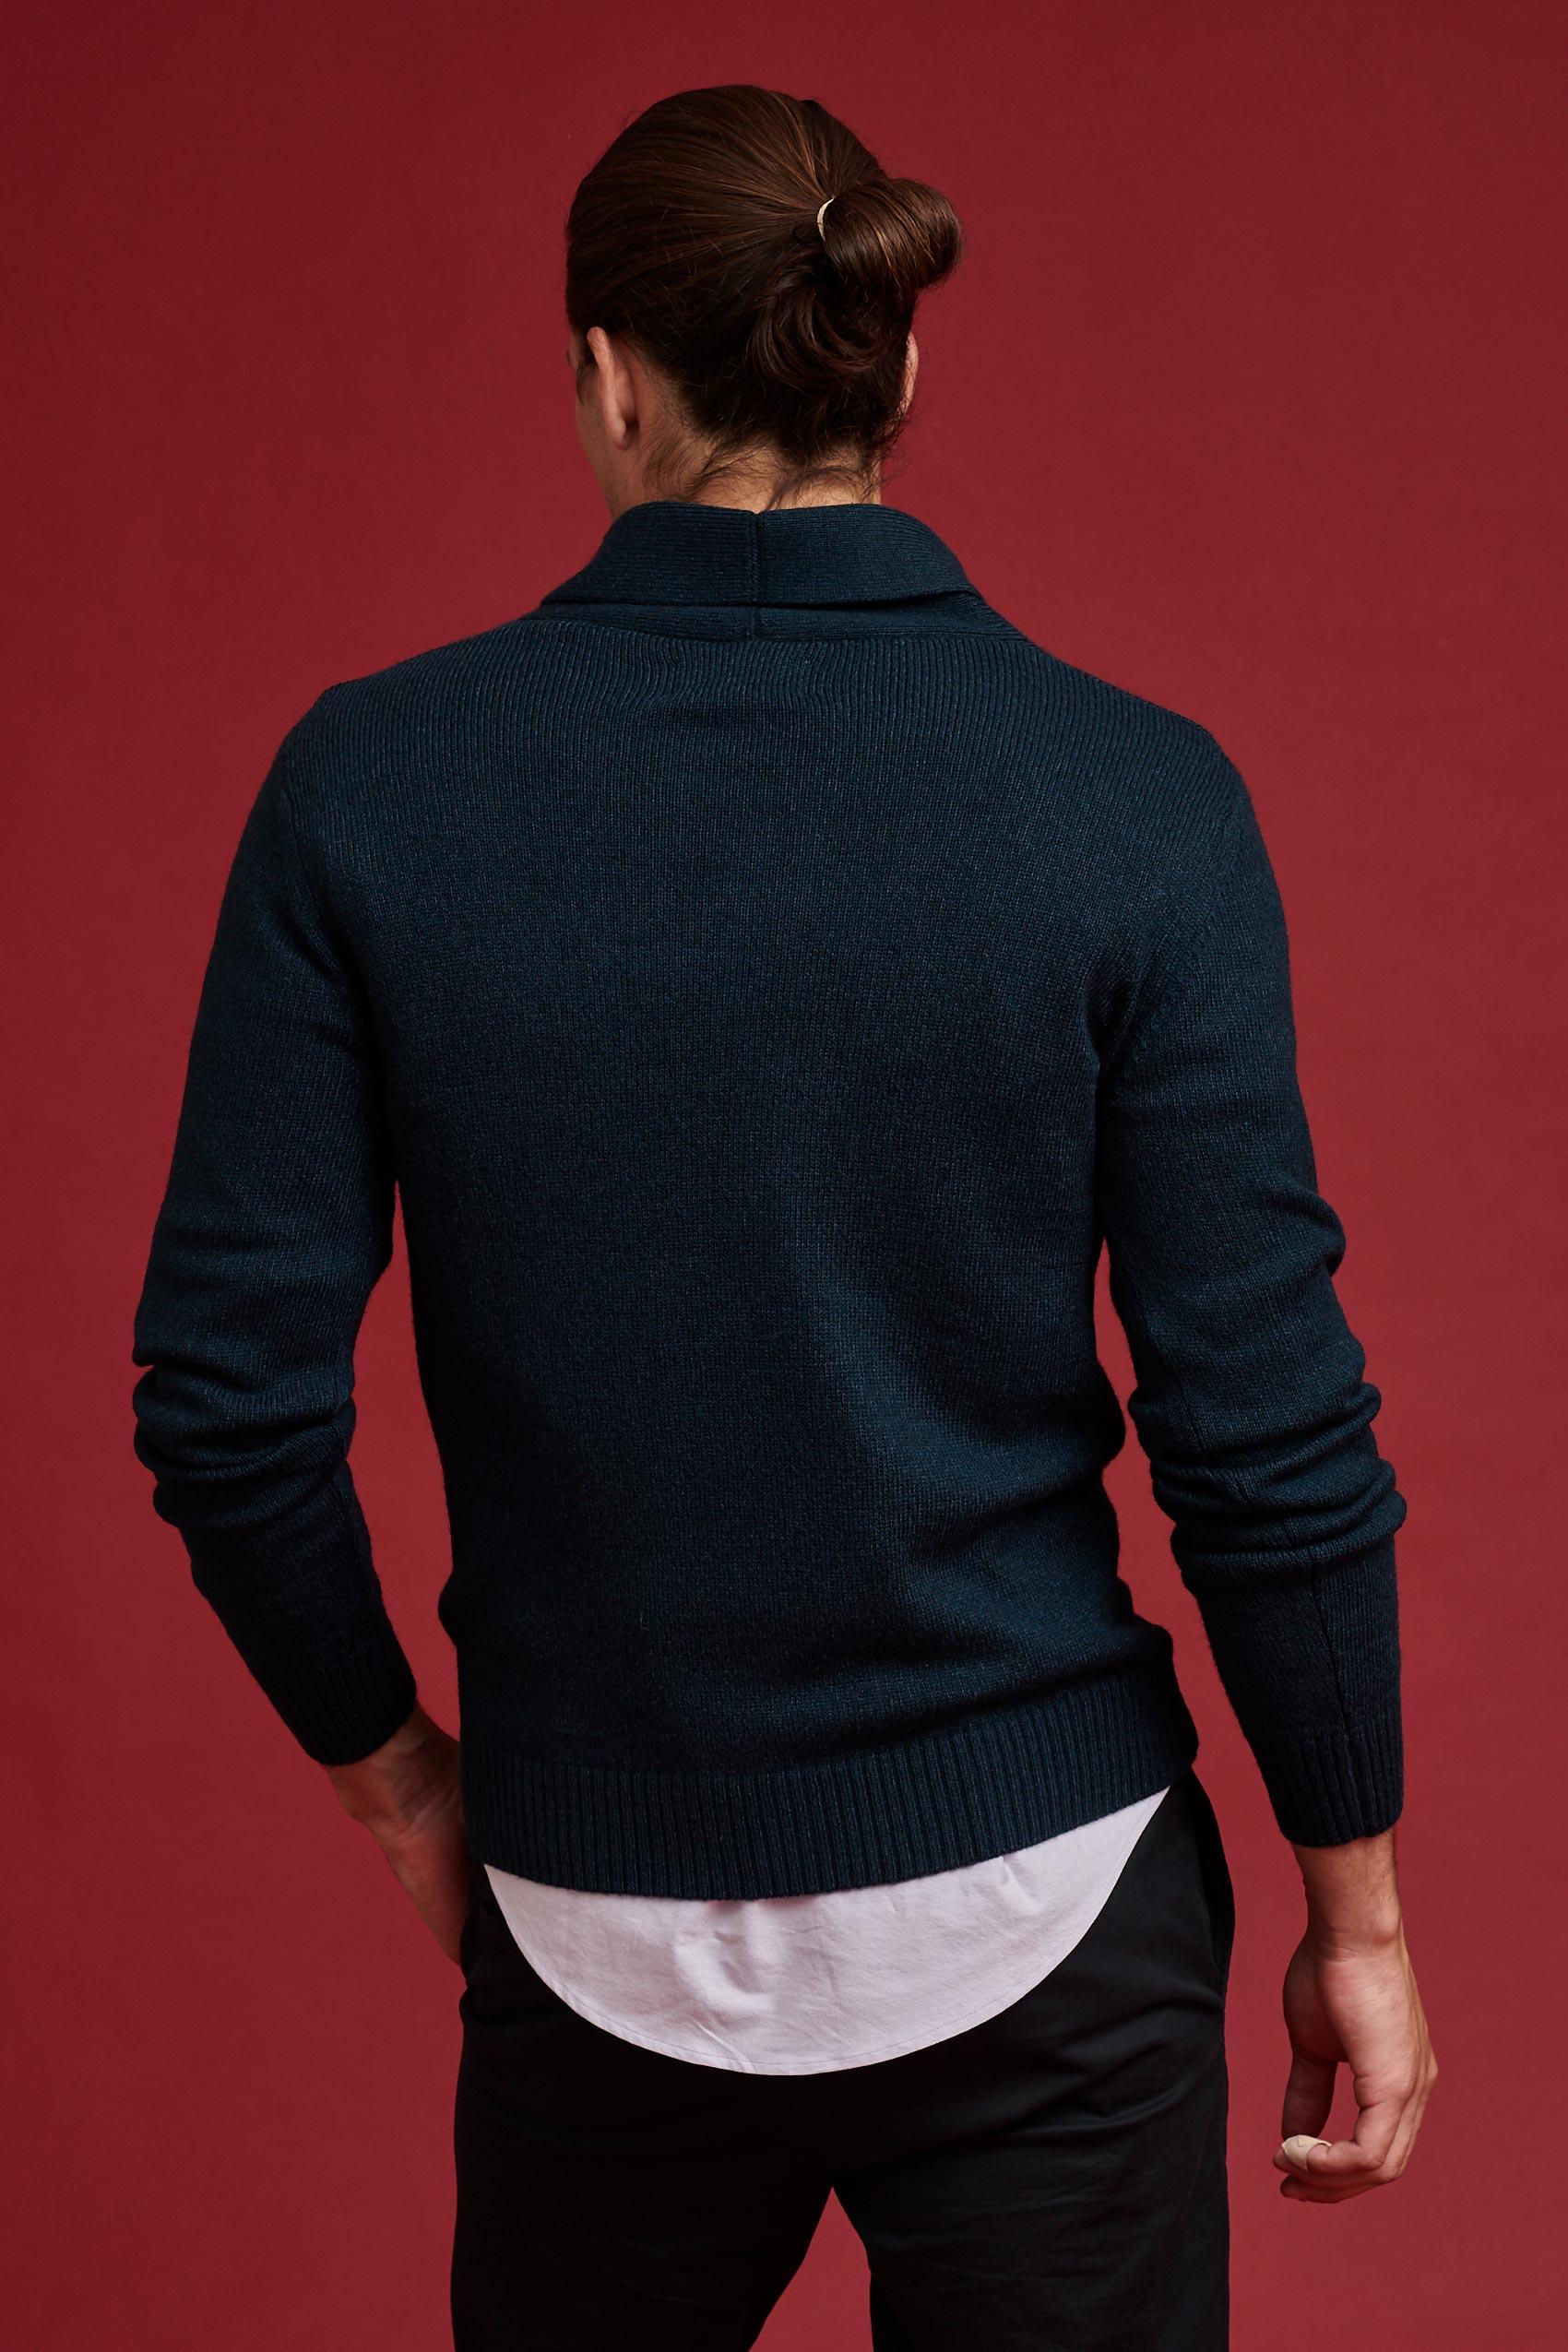 penguin_shawl-collar-sweater_00-14-2020__picture-14752